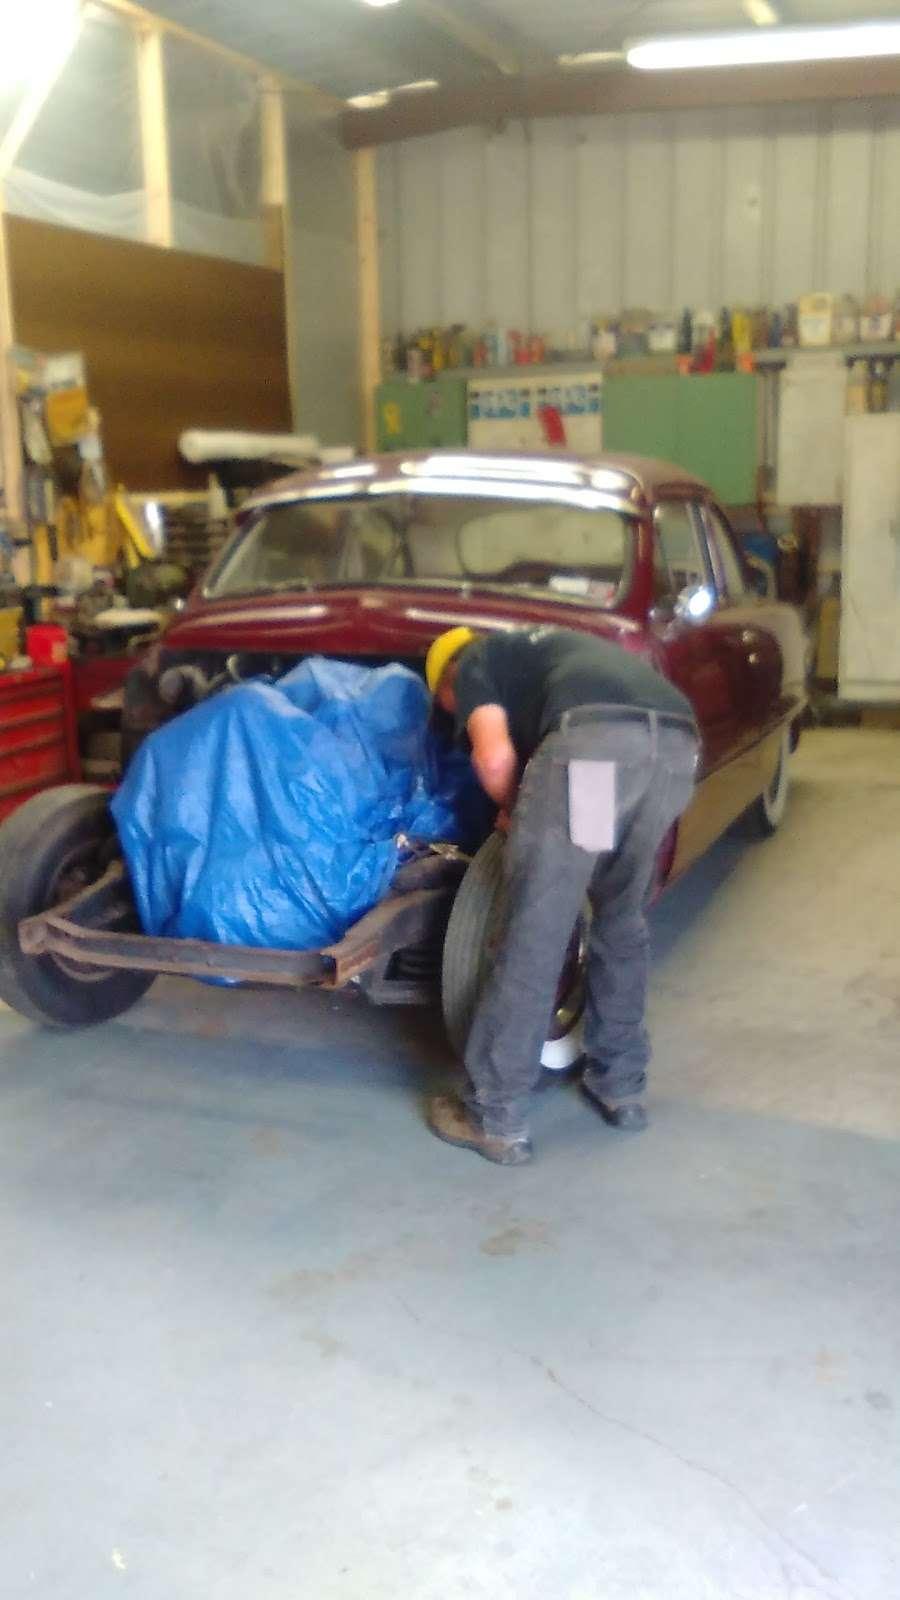 MrCs Automotive Repair And Restoration - car repair  | Photo 4 of 10 | Address: 114 E 12th St, Salisbury, NC 28144, USA | Phone: (336) 554-5501